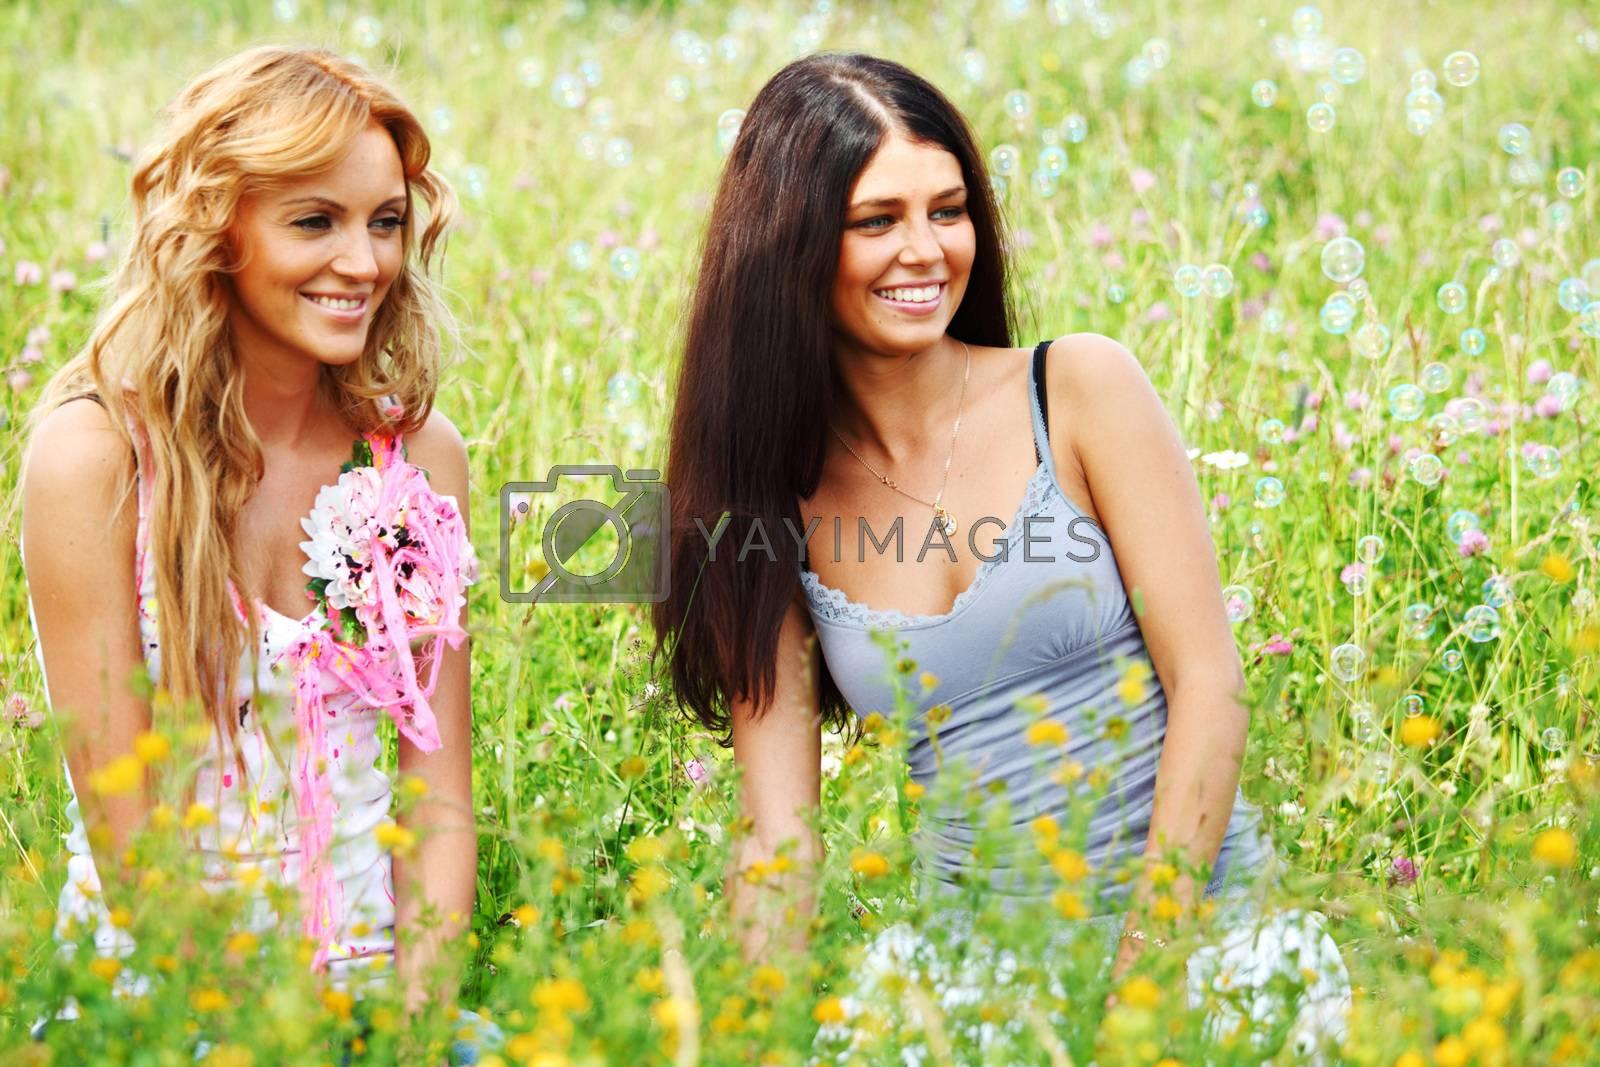 Beautiful girls having fun outdoors, girlfriends on green grass field in soap bubbles